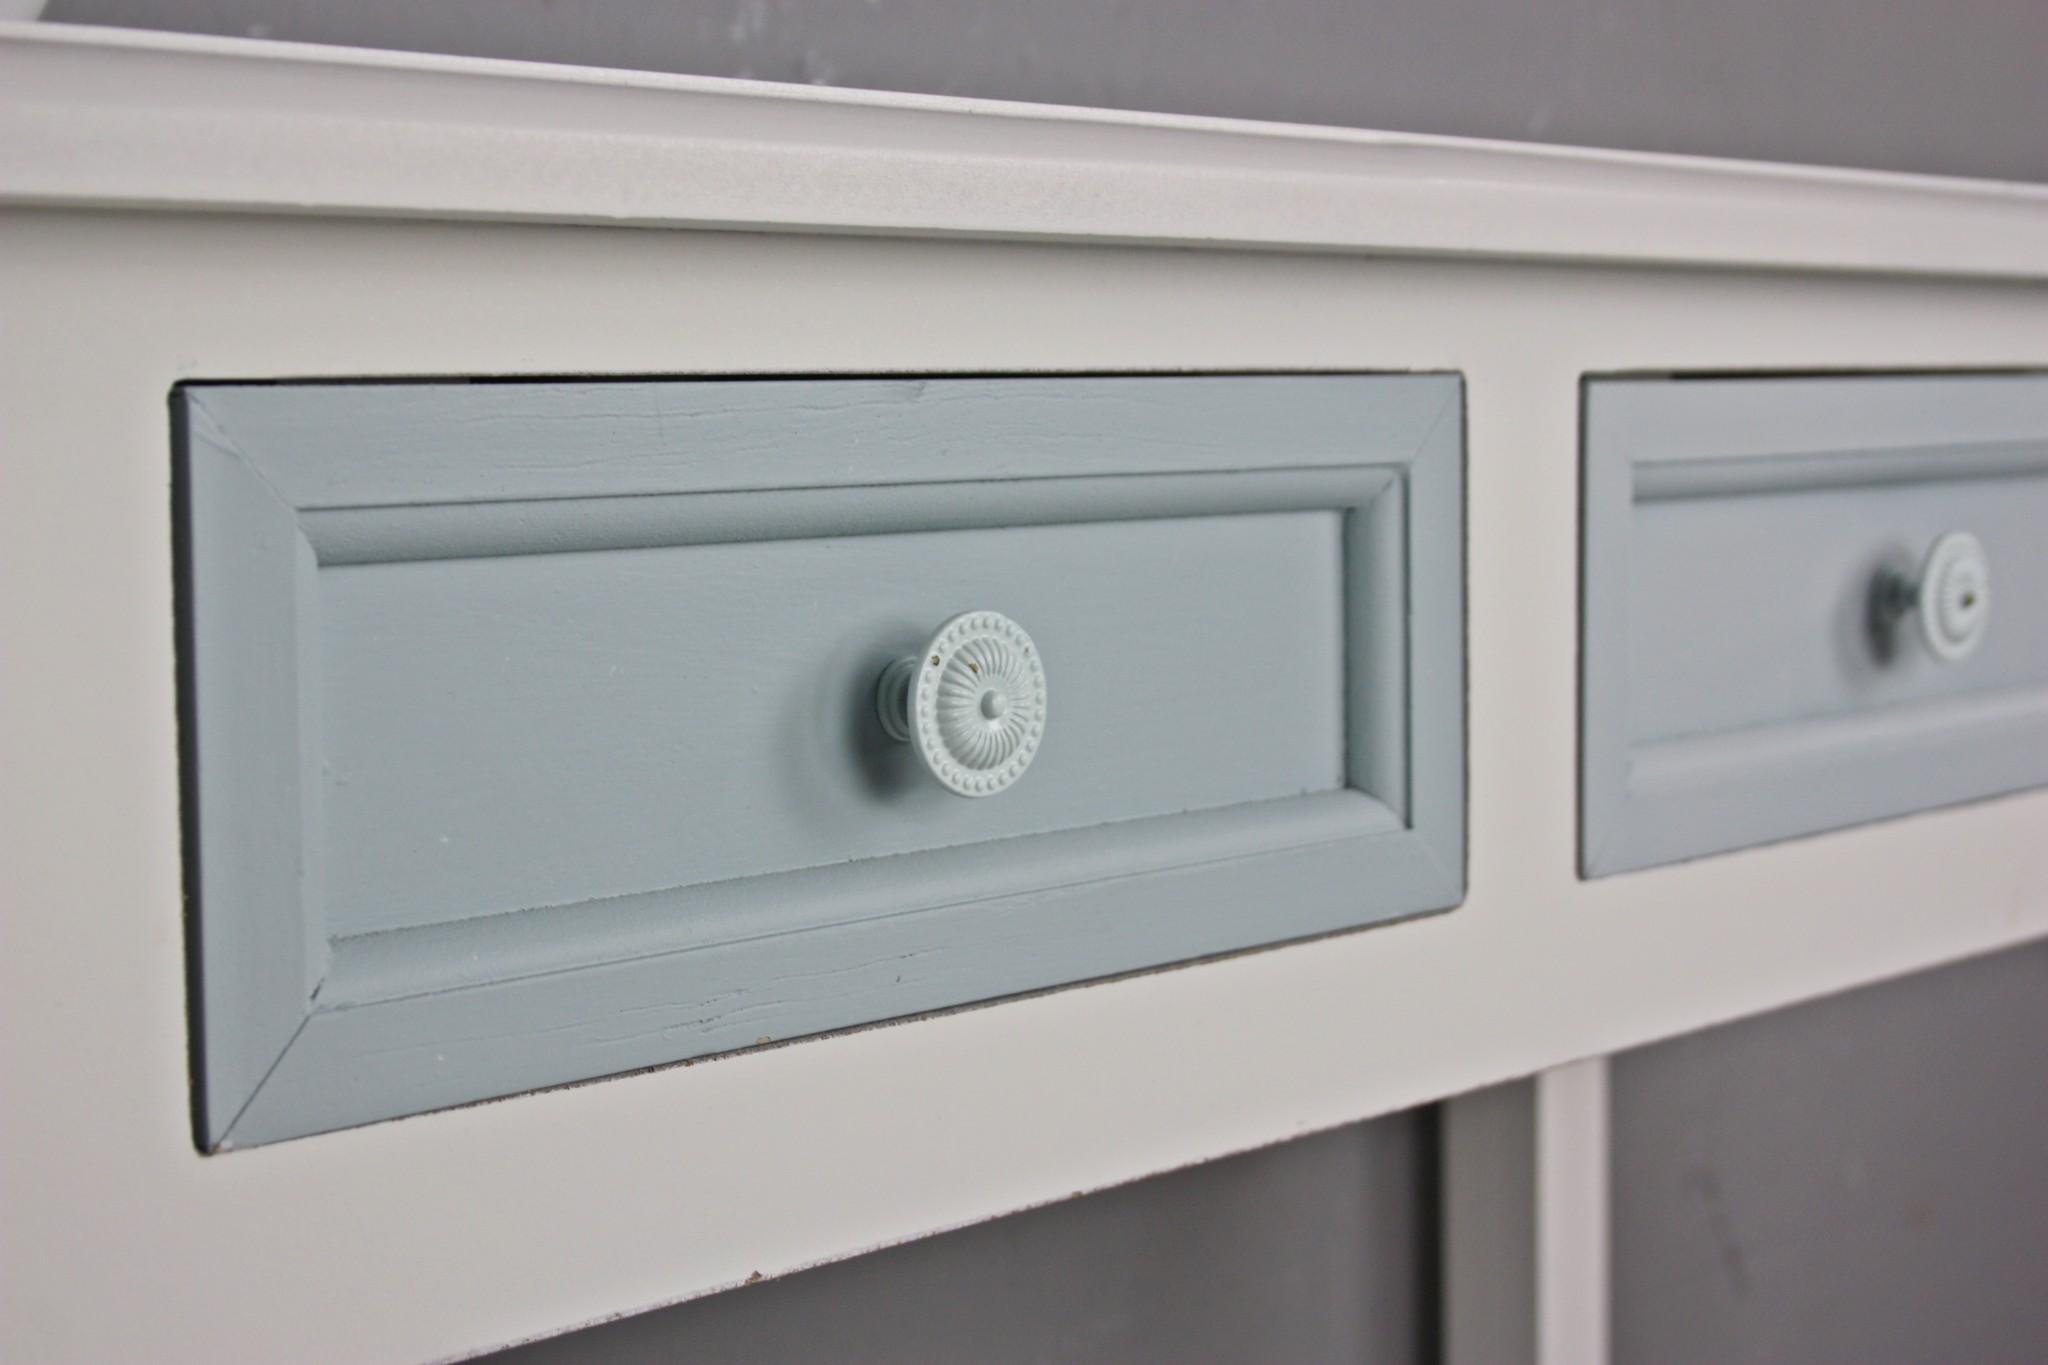 konsole 2 schubladen wei blau. Black Bedroom Furniture Sets. Home Design Ideas